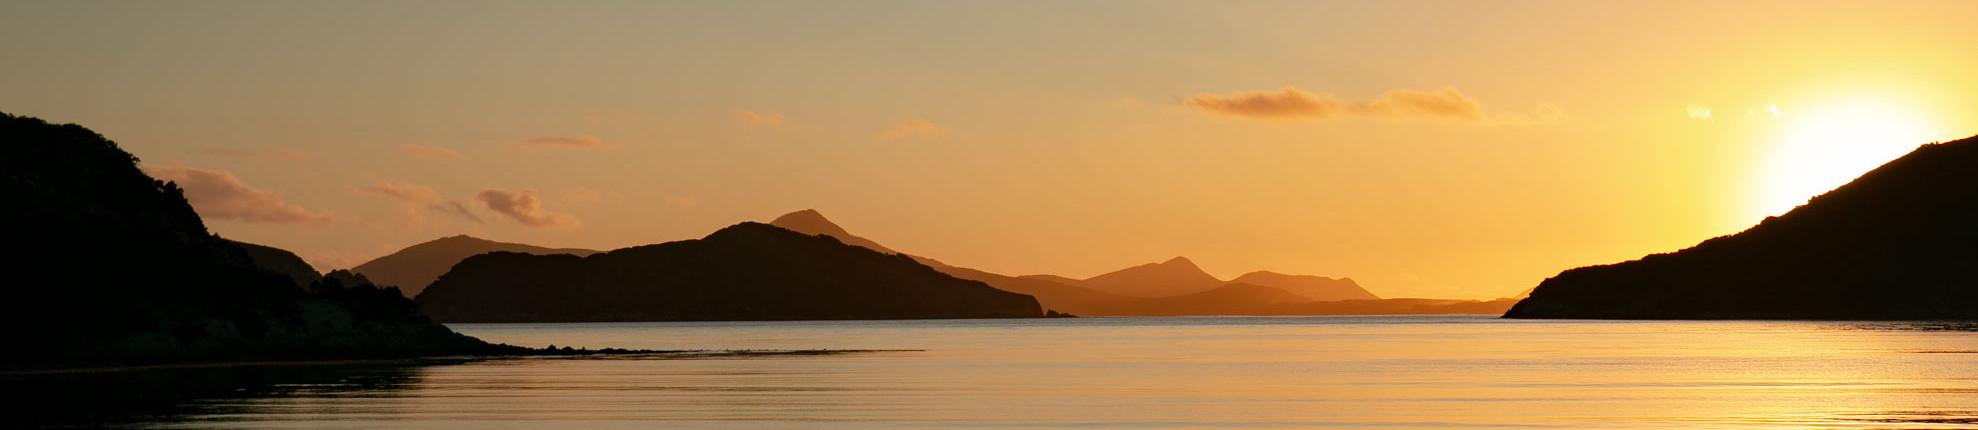 Port-Davey-Sun-set.jpg